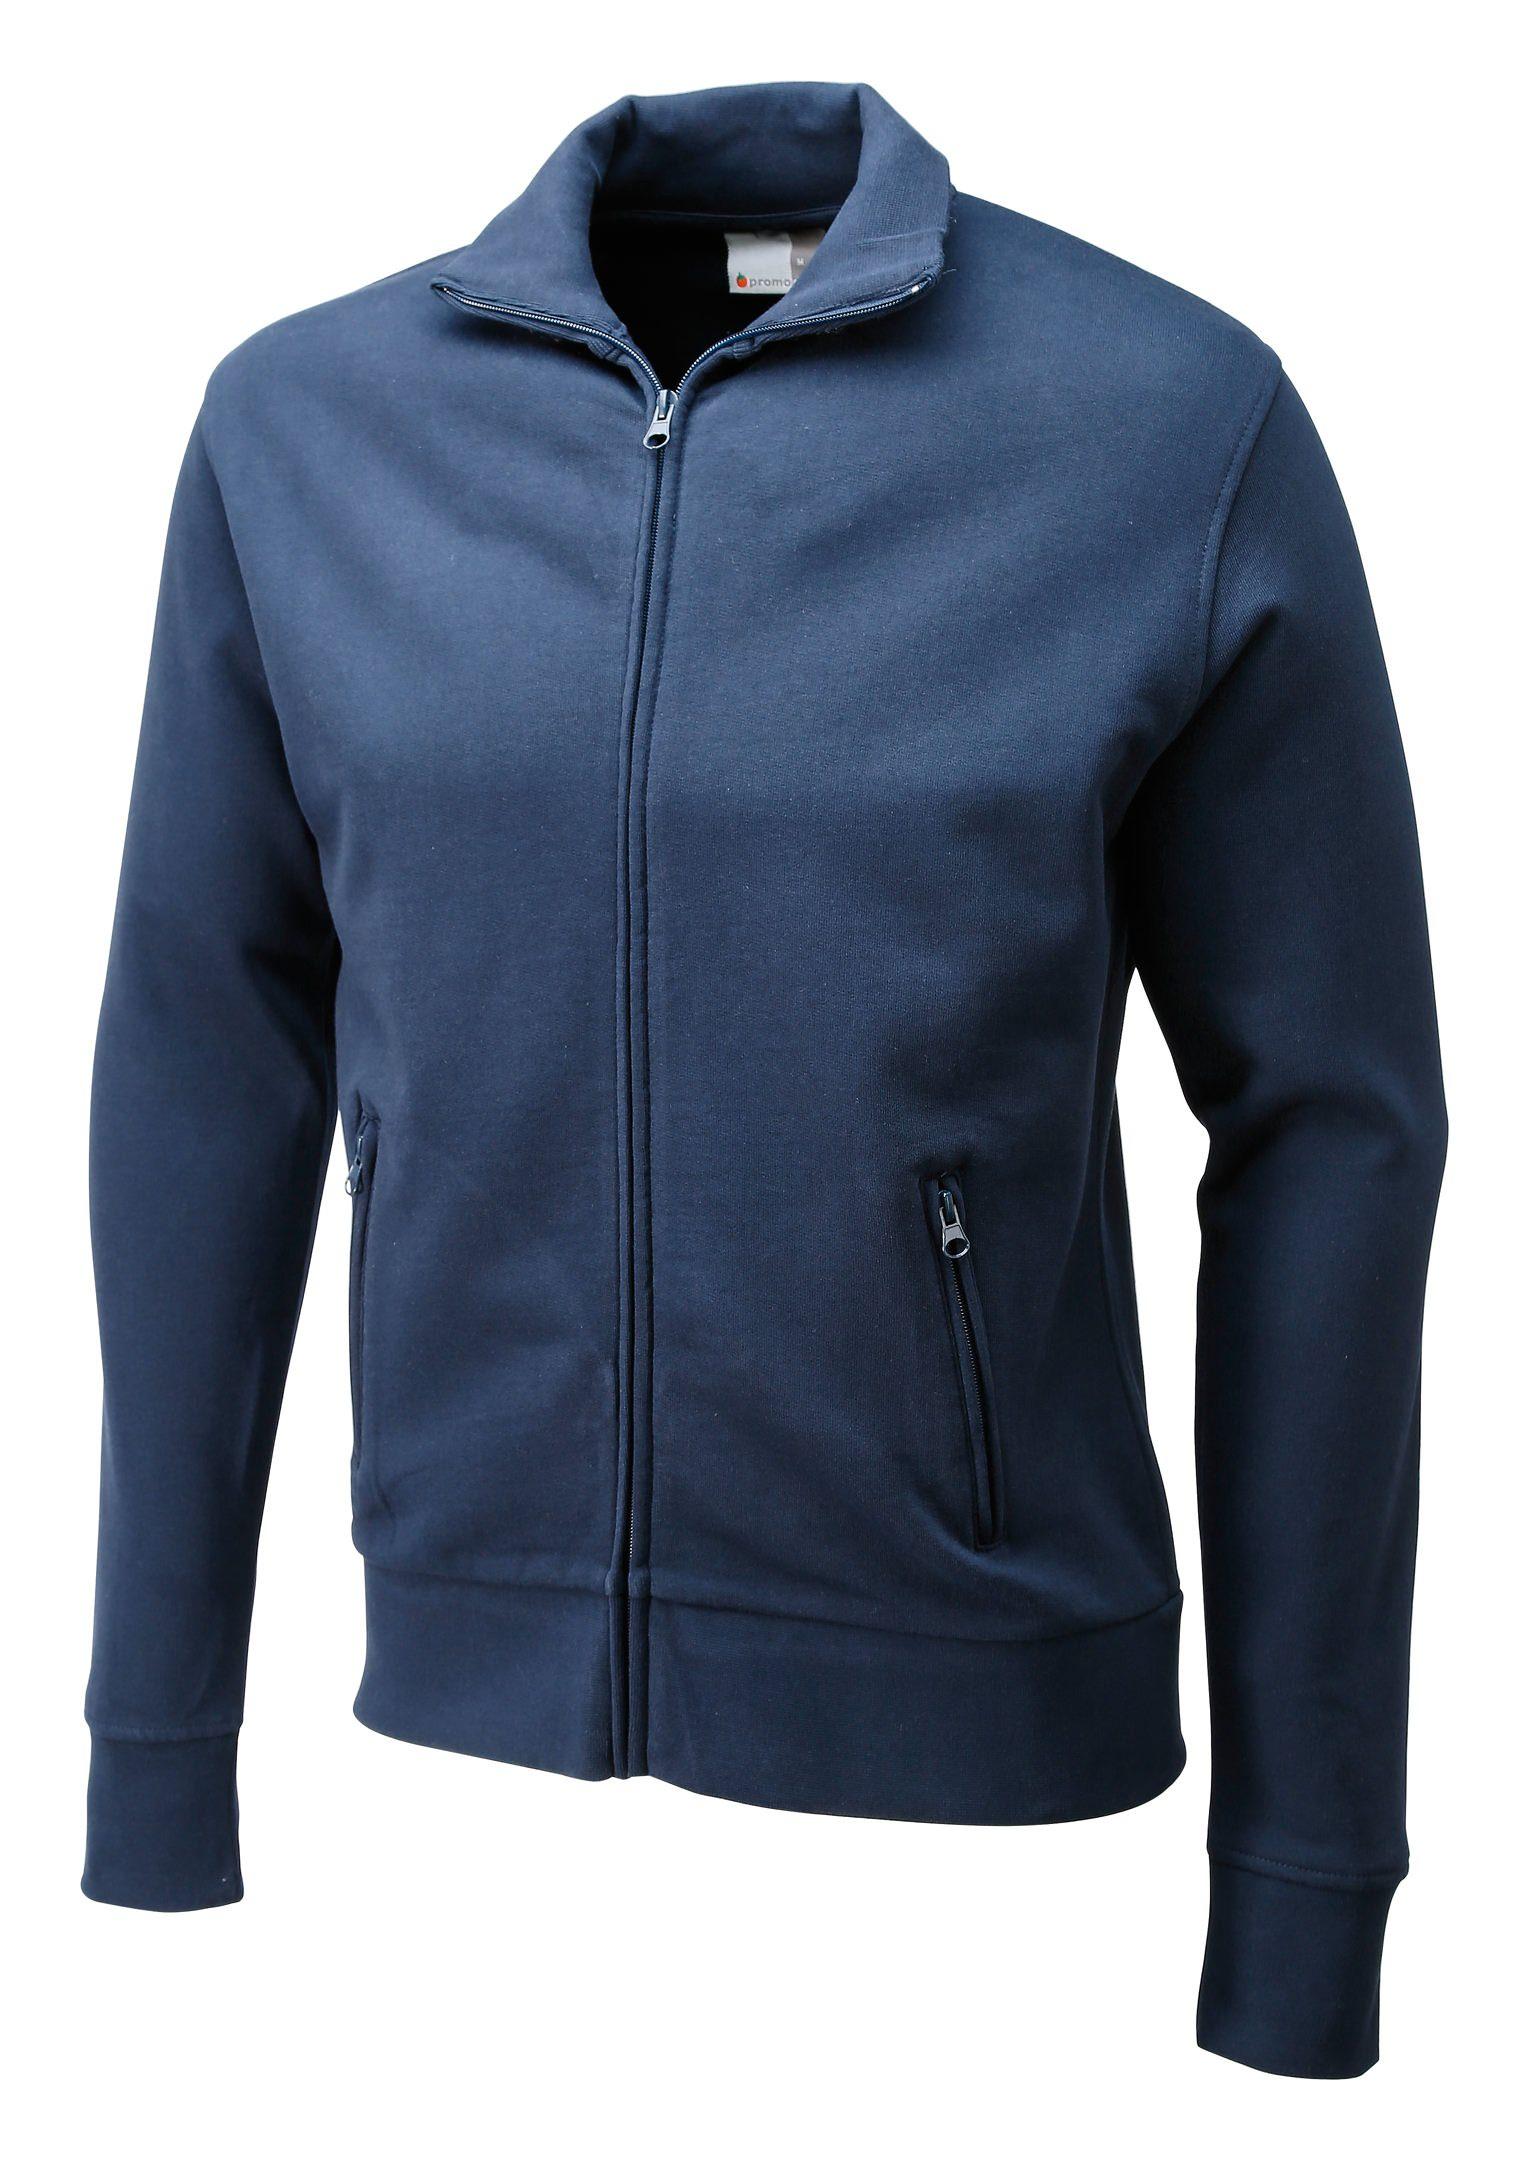 Sweatshirtjacke Größe XXL navy - 5290F-54-2XL